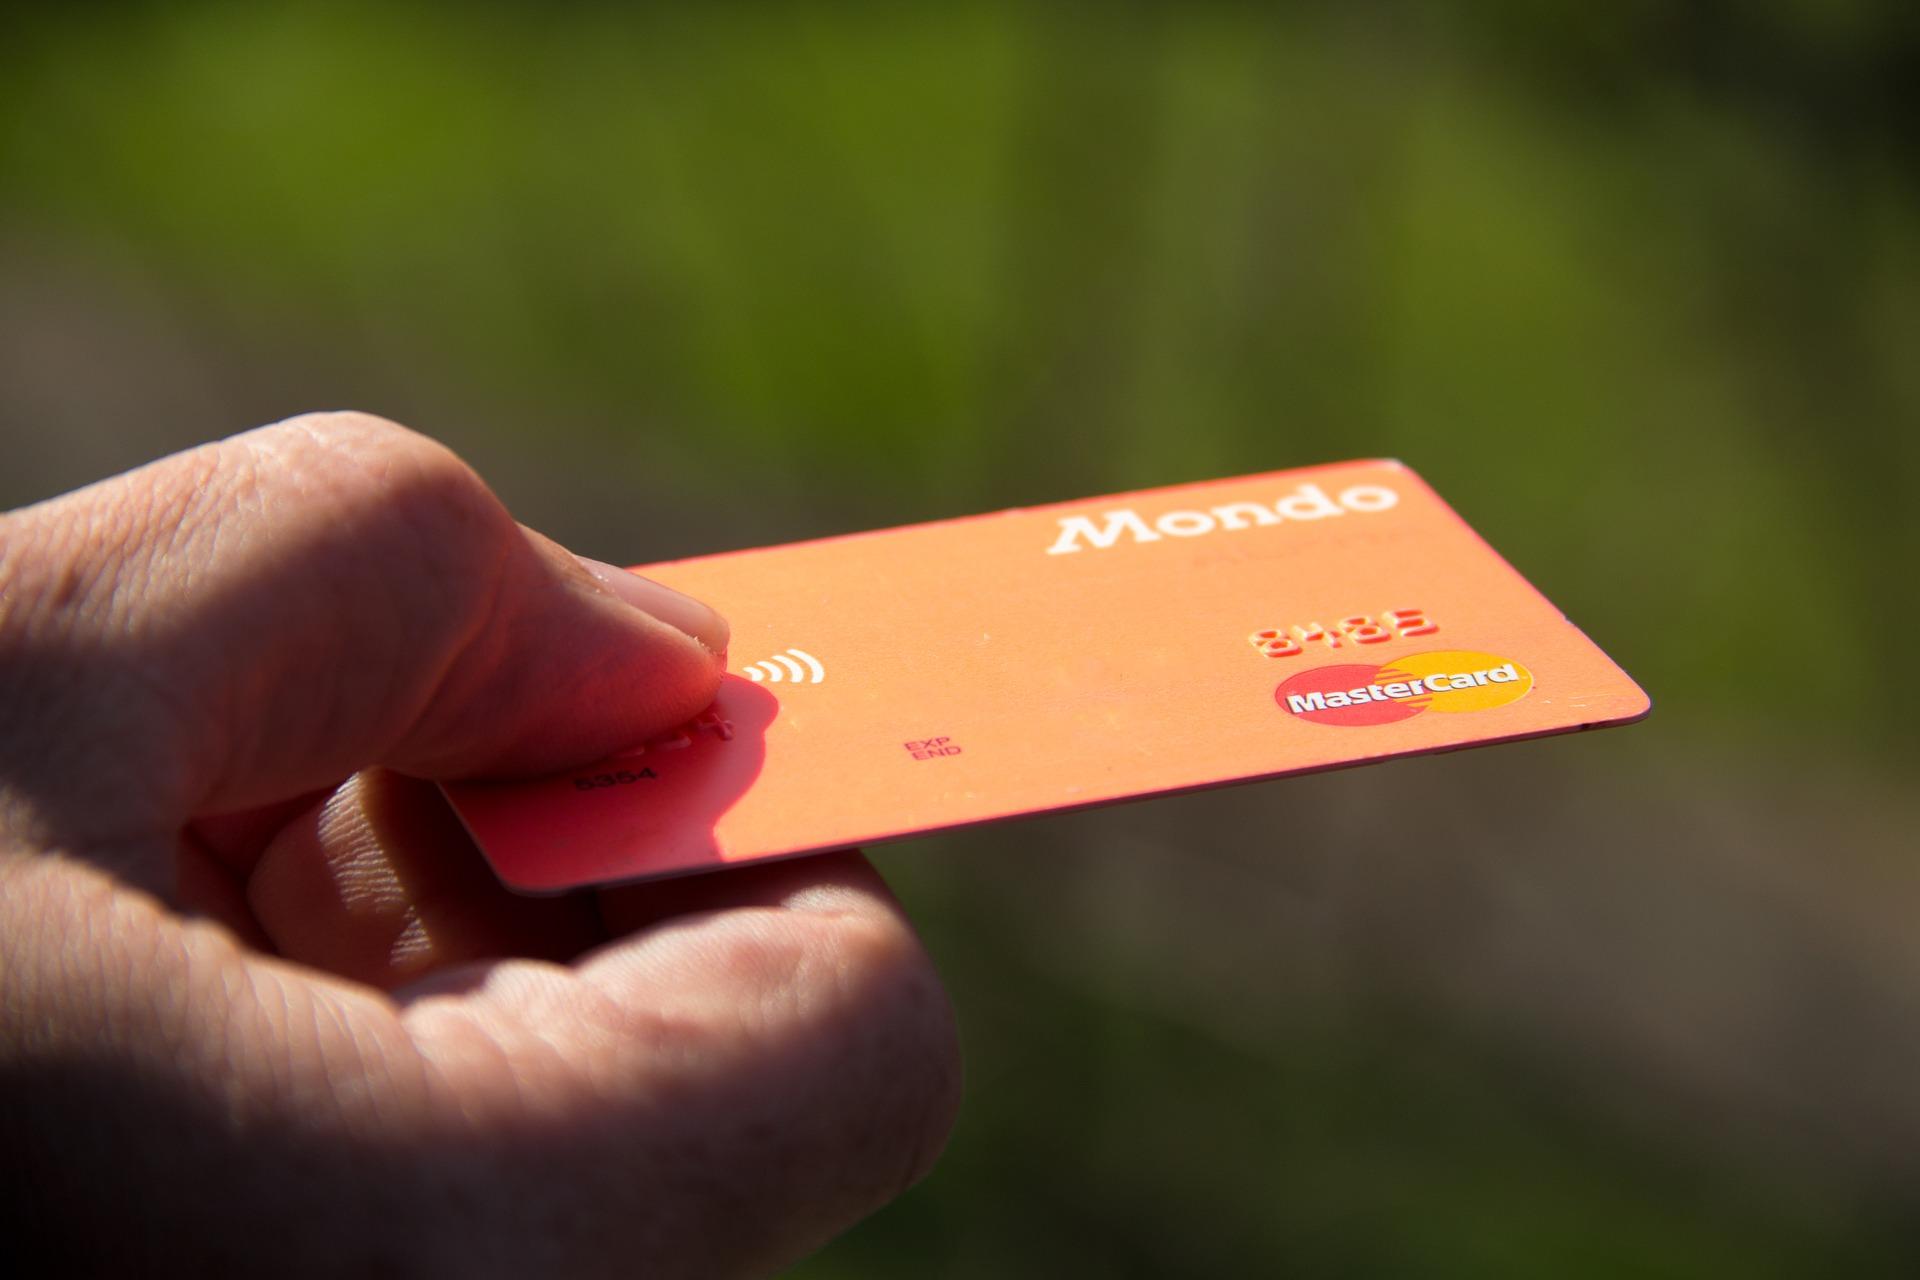 Mastercard perevodyť plateži na tehnologiju blockchain